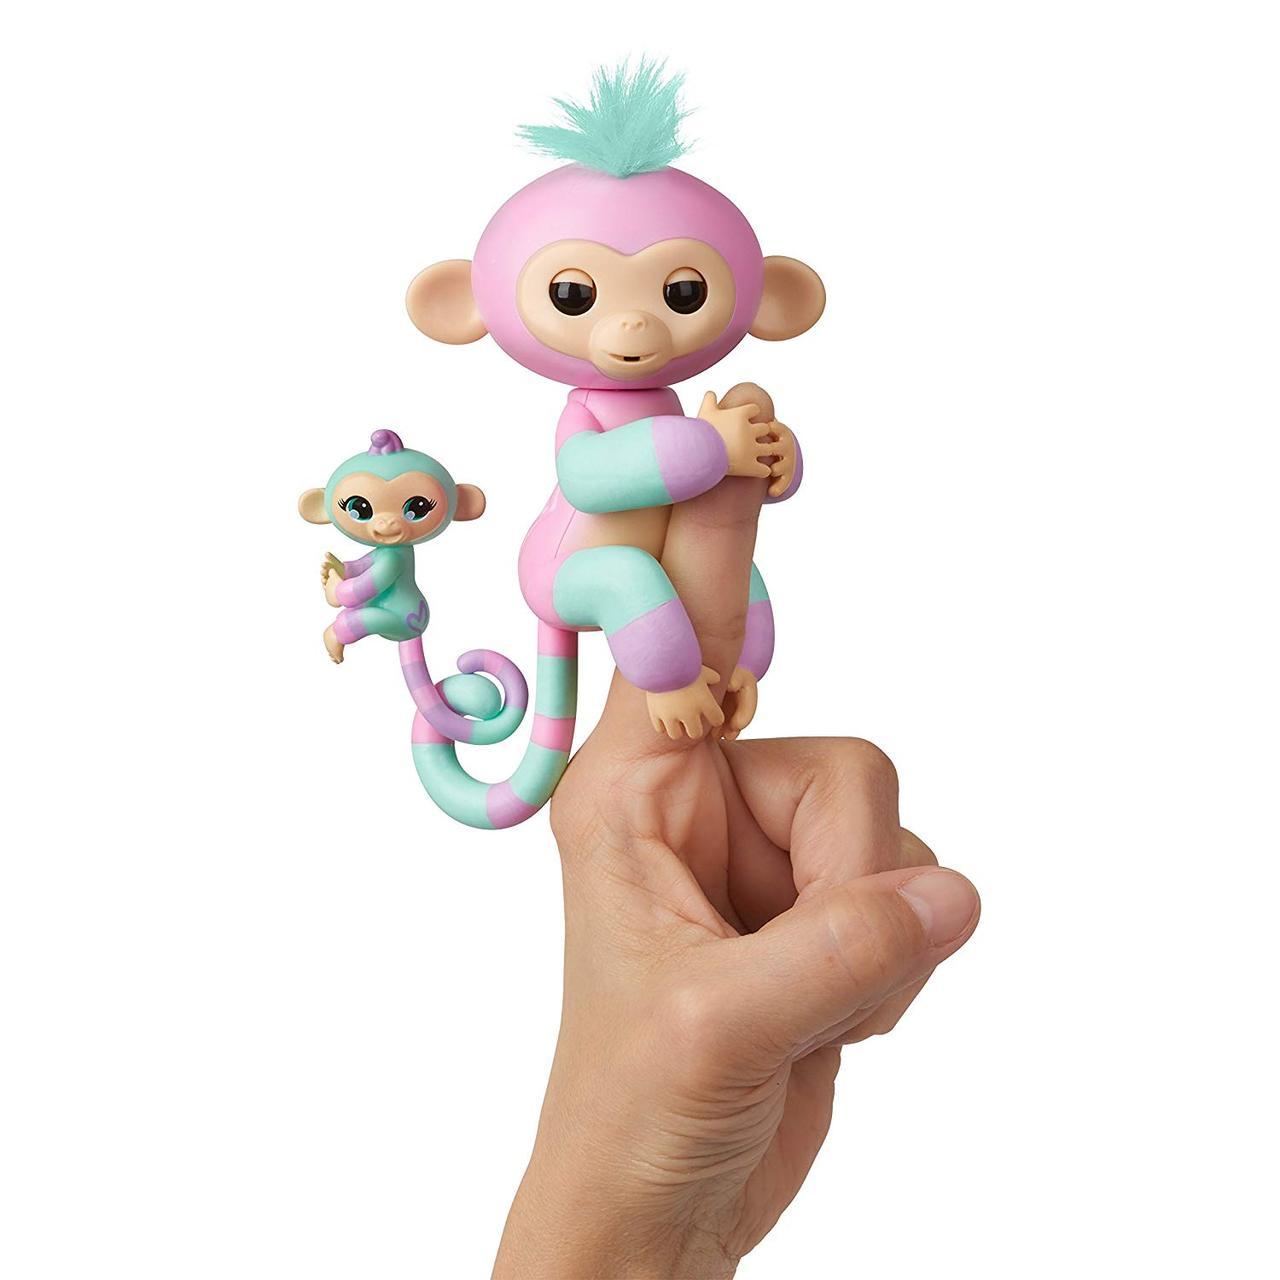 Интерактивная ручная обезьянка мама и малыш, Эшли и Шанс, WowWee Fingerlings Baby Monkey & Mini BFFs